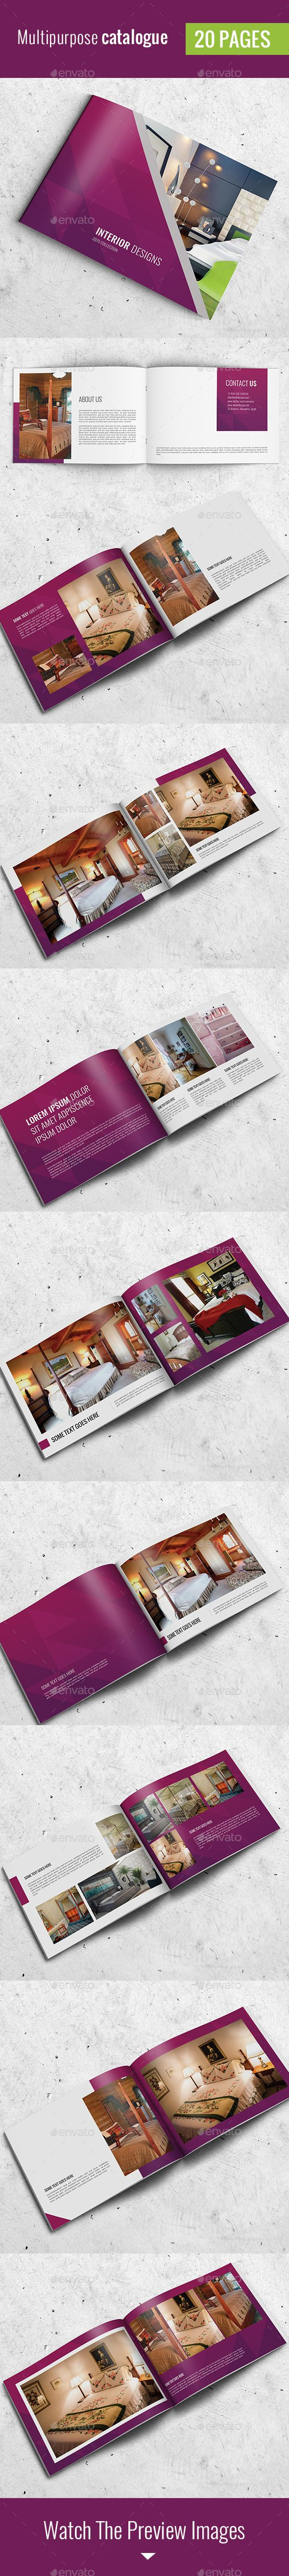 Simple Catalog / Portfolio / Brochure 2 - Catalogs Brochures